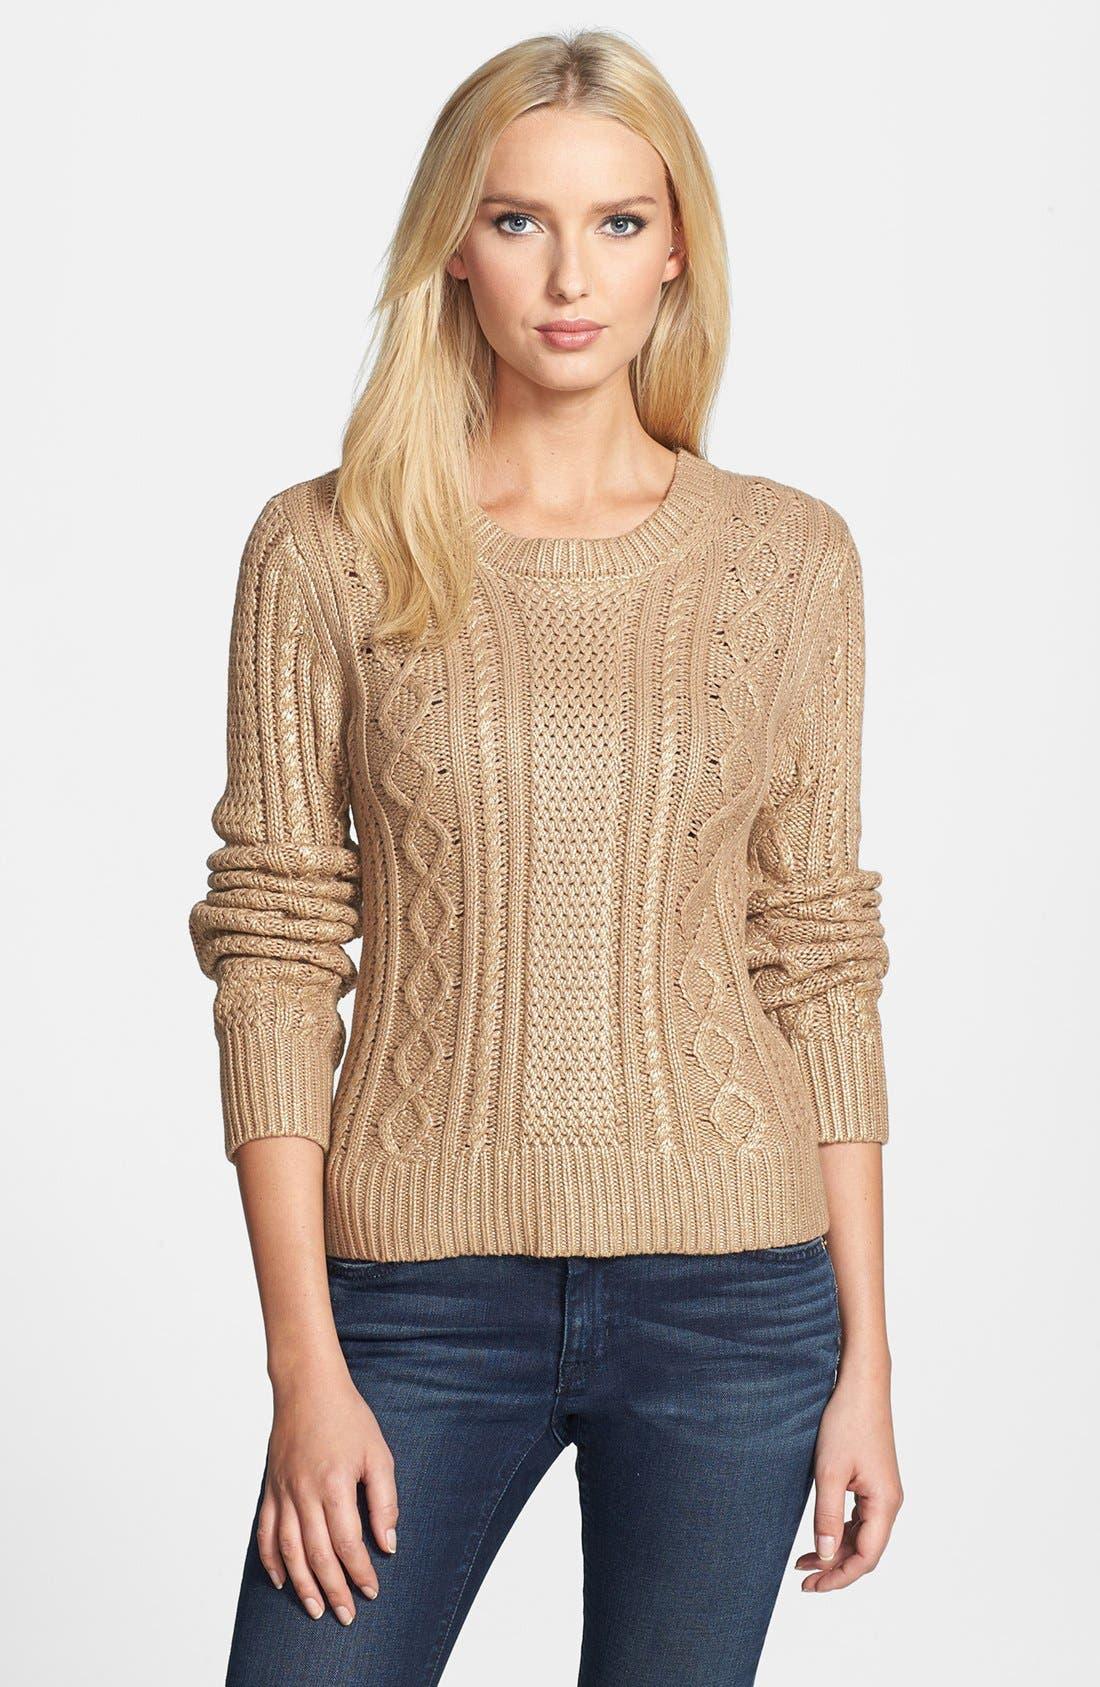 Main Image - MICHAEL Michael Kors Foiled Cable Knit Cotton Blend Sweater